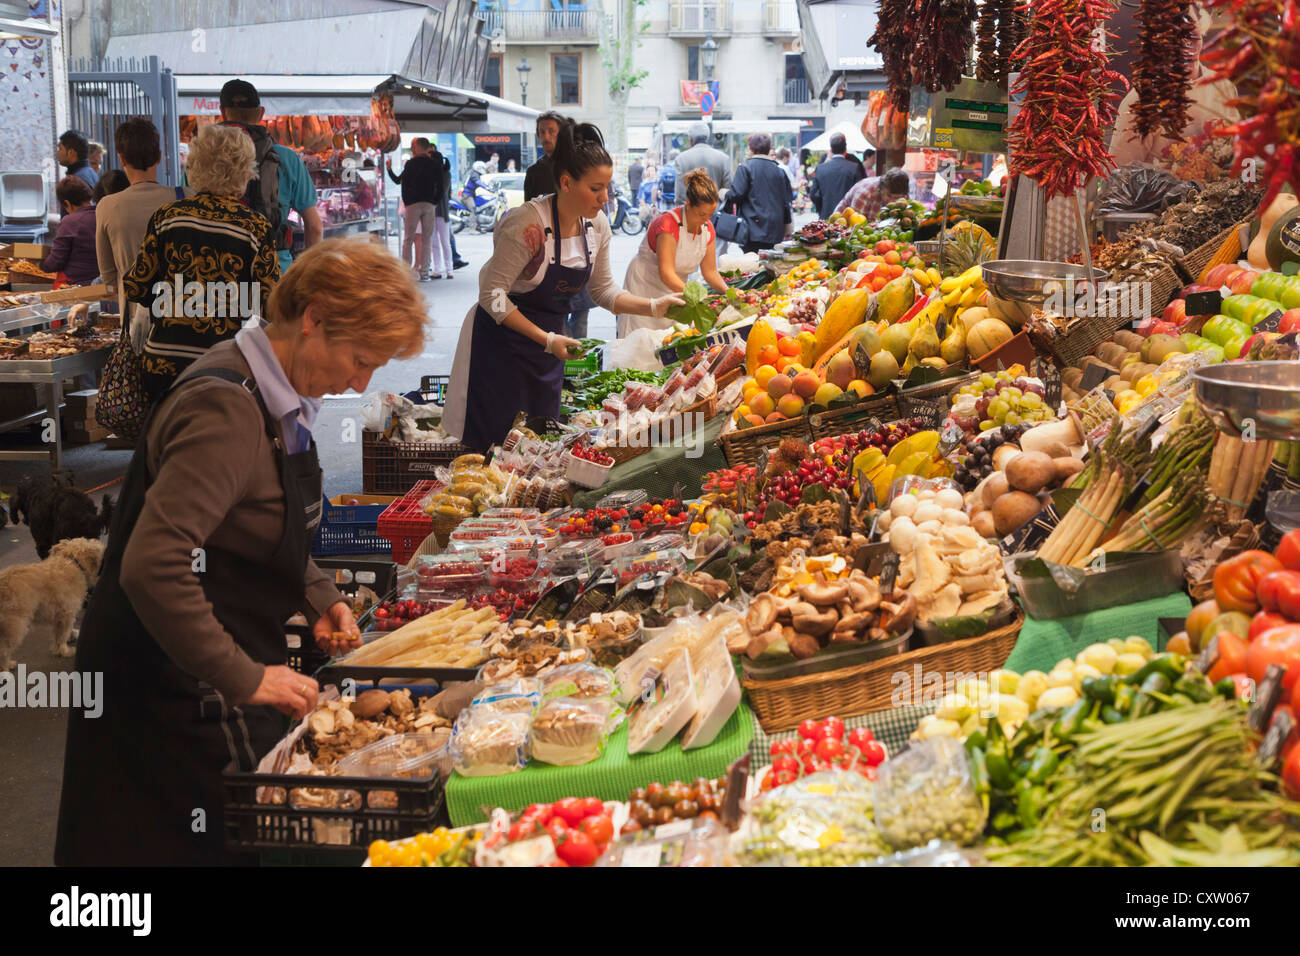 Barcelona, Spain. Mercat de Sant Josep, the market known popularly as La Boqueria. - Stock Image